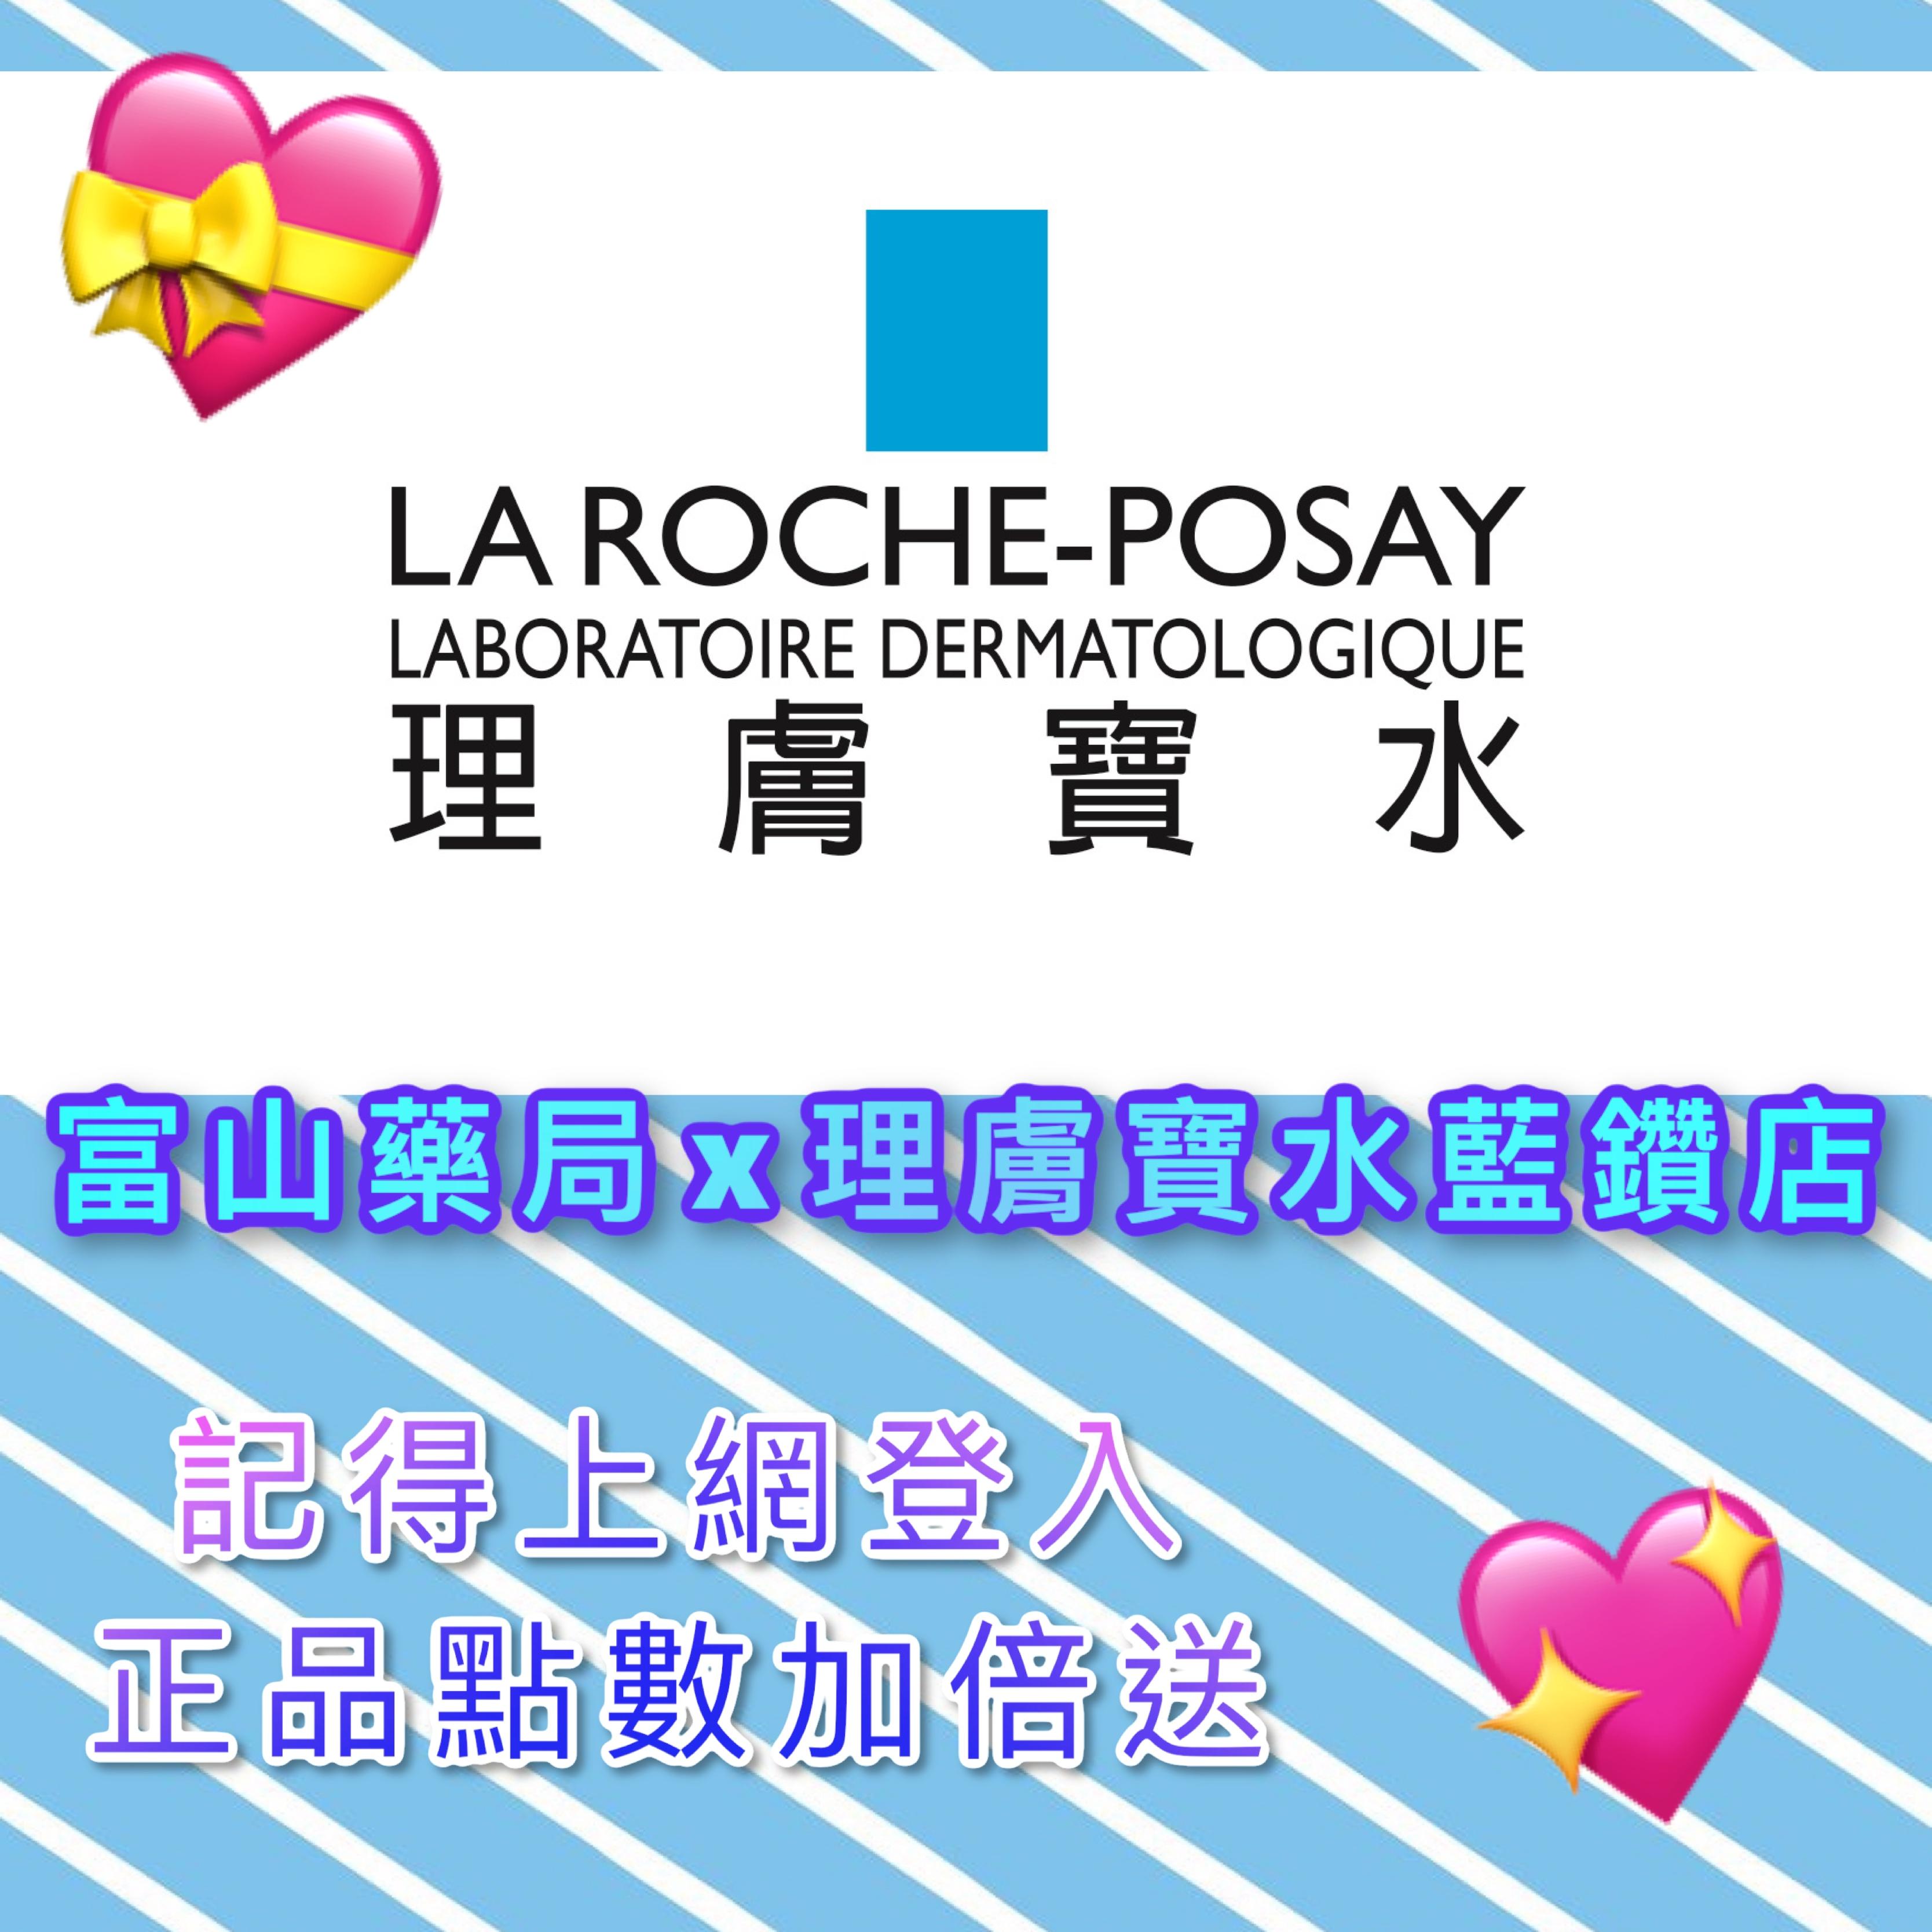 理膚寶水 LA ROCHE-POSAY 瞬效控油噴霧 【富山】